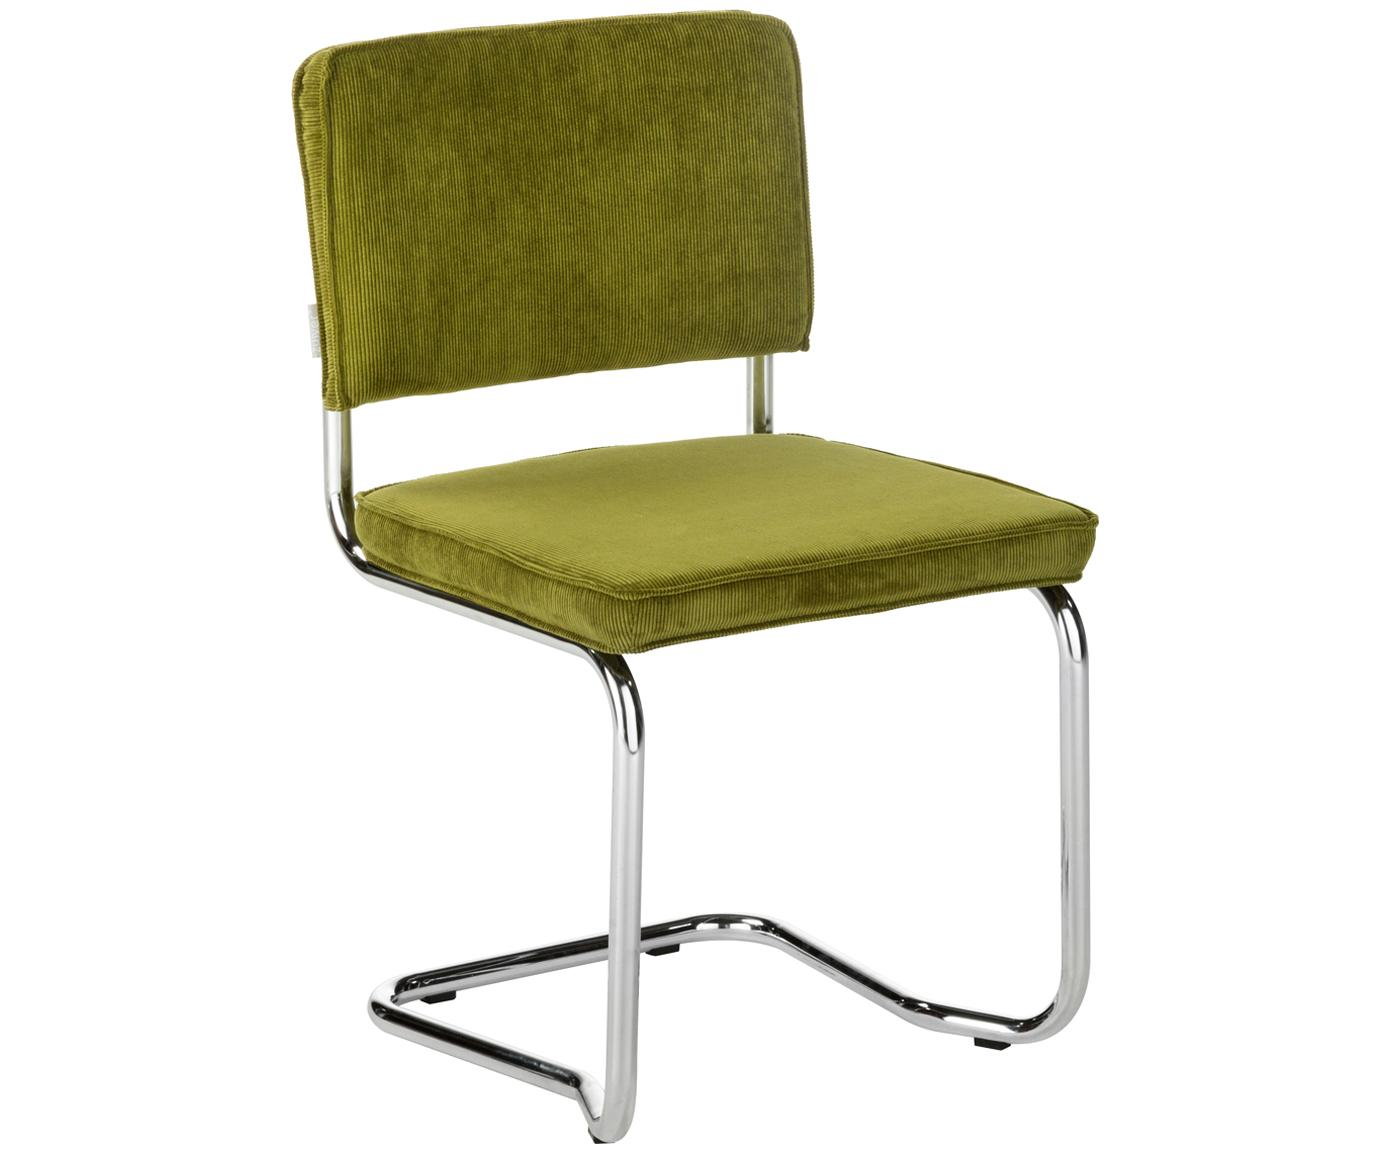 Sedia cantilever Ridge Kink Chair, Rivestimento: 88% nylon, 12% poliestere, Struttura: metallo cromato Il rivest, Verde, Larg. 48 x Alt. 85 cm